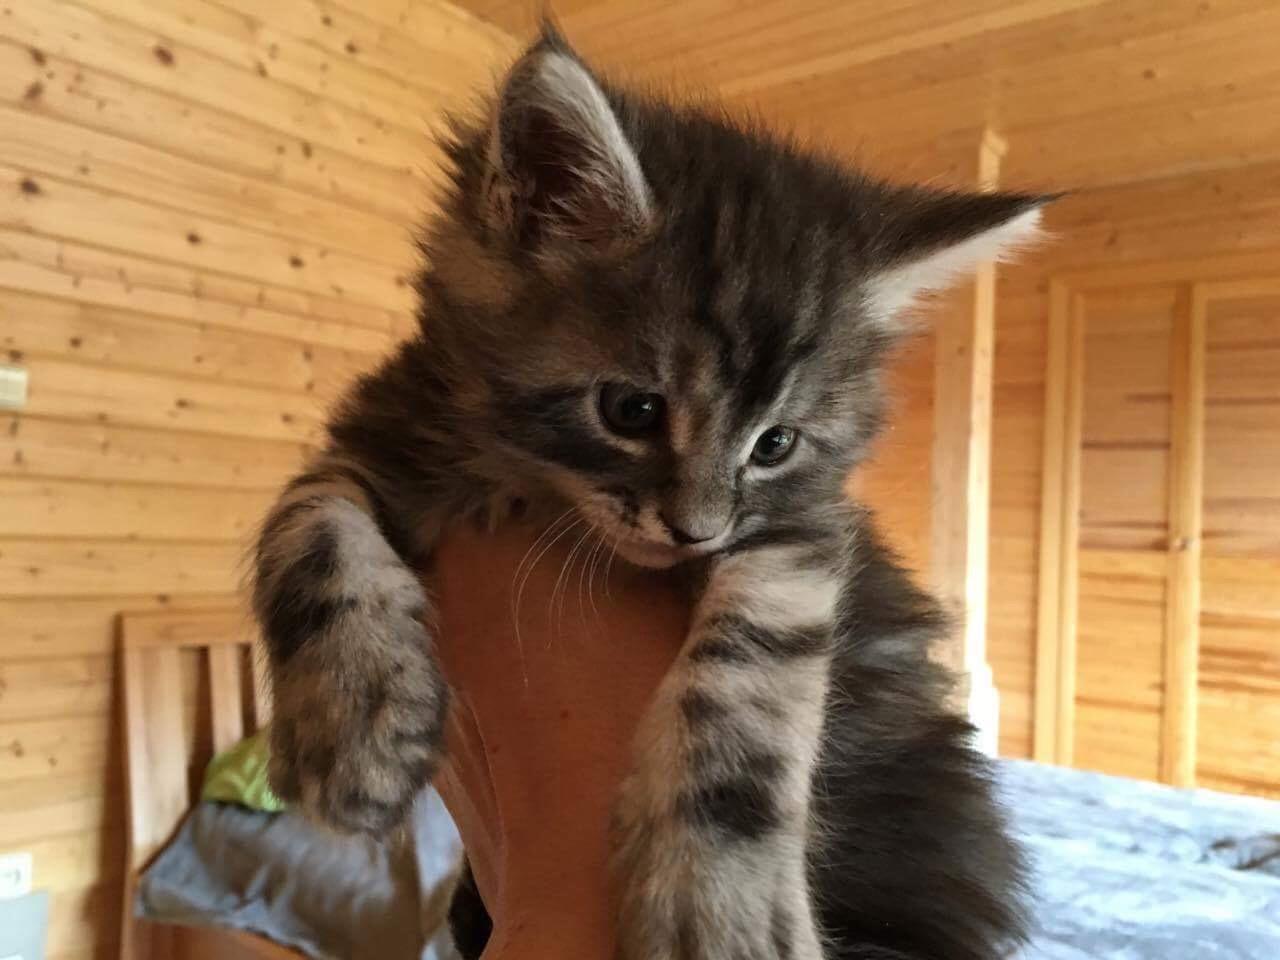 fotka kočky VRH B: Bastien von Erillian, CZ